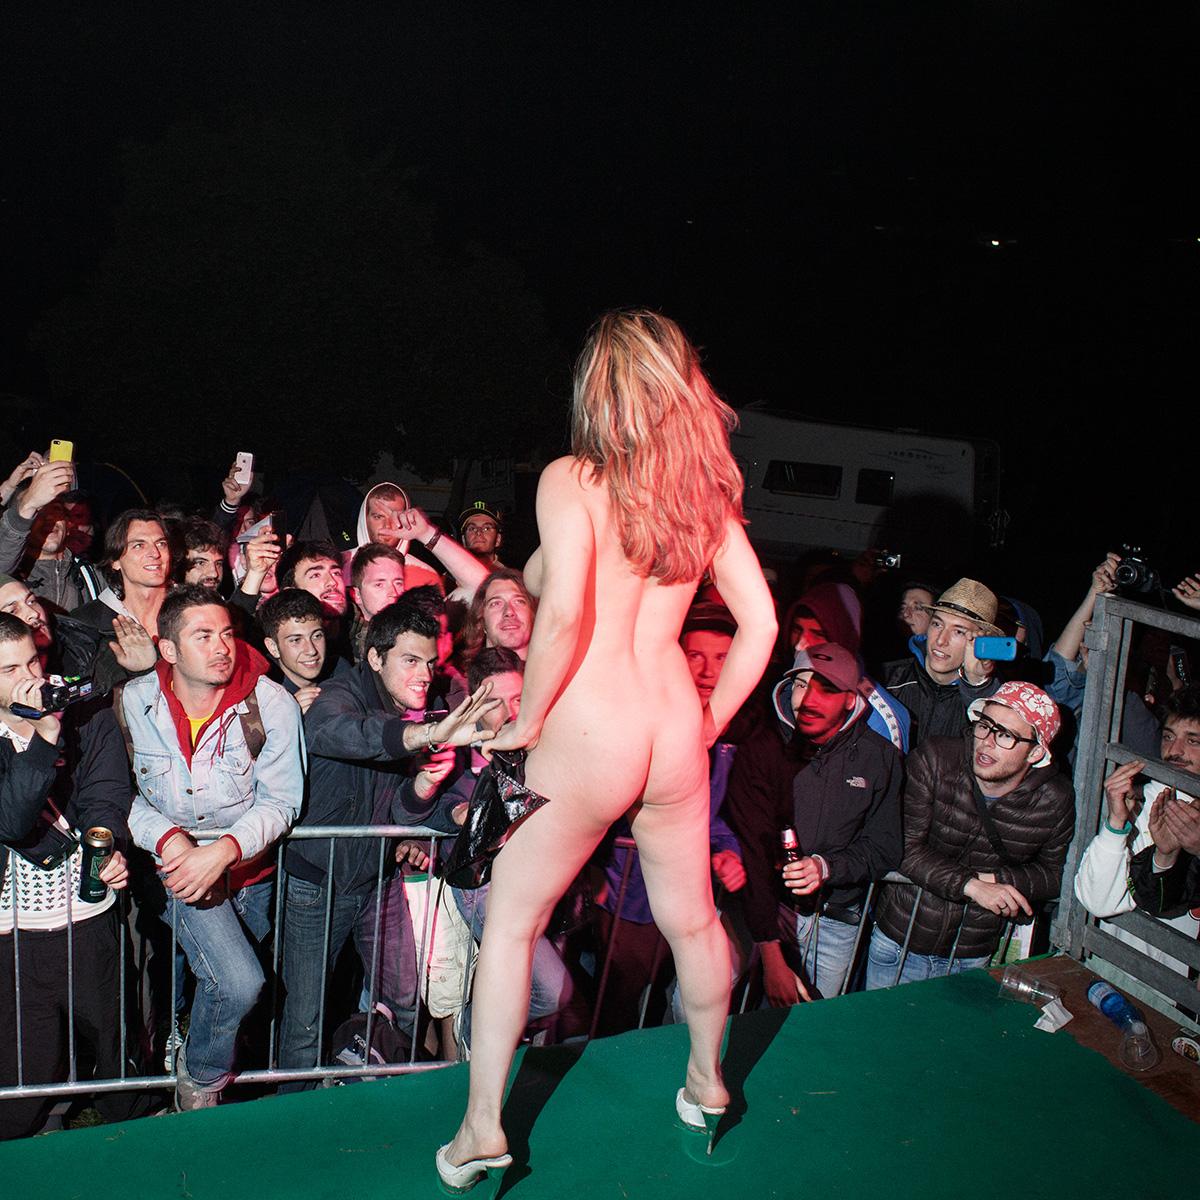 Kaushambi Milan Italy In In Night Club Girls